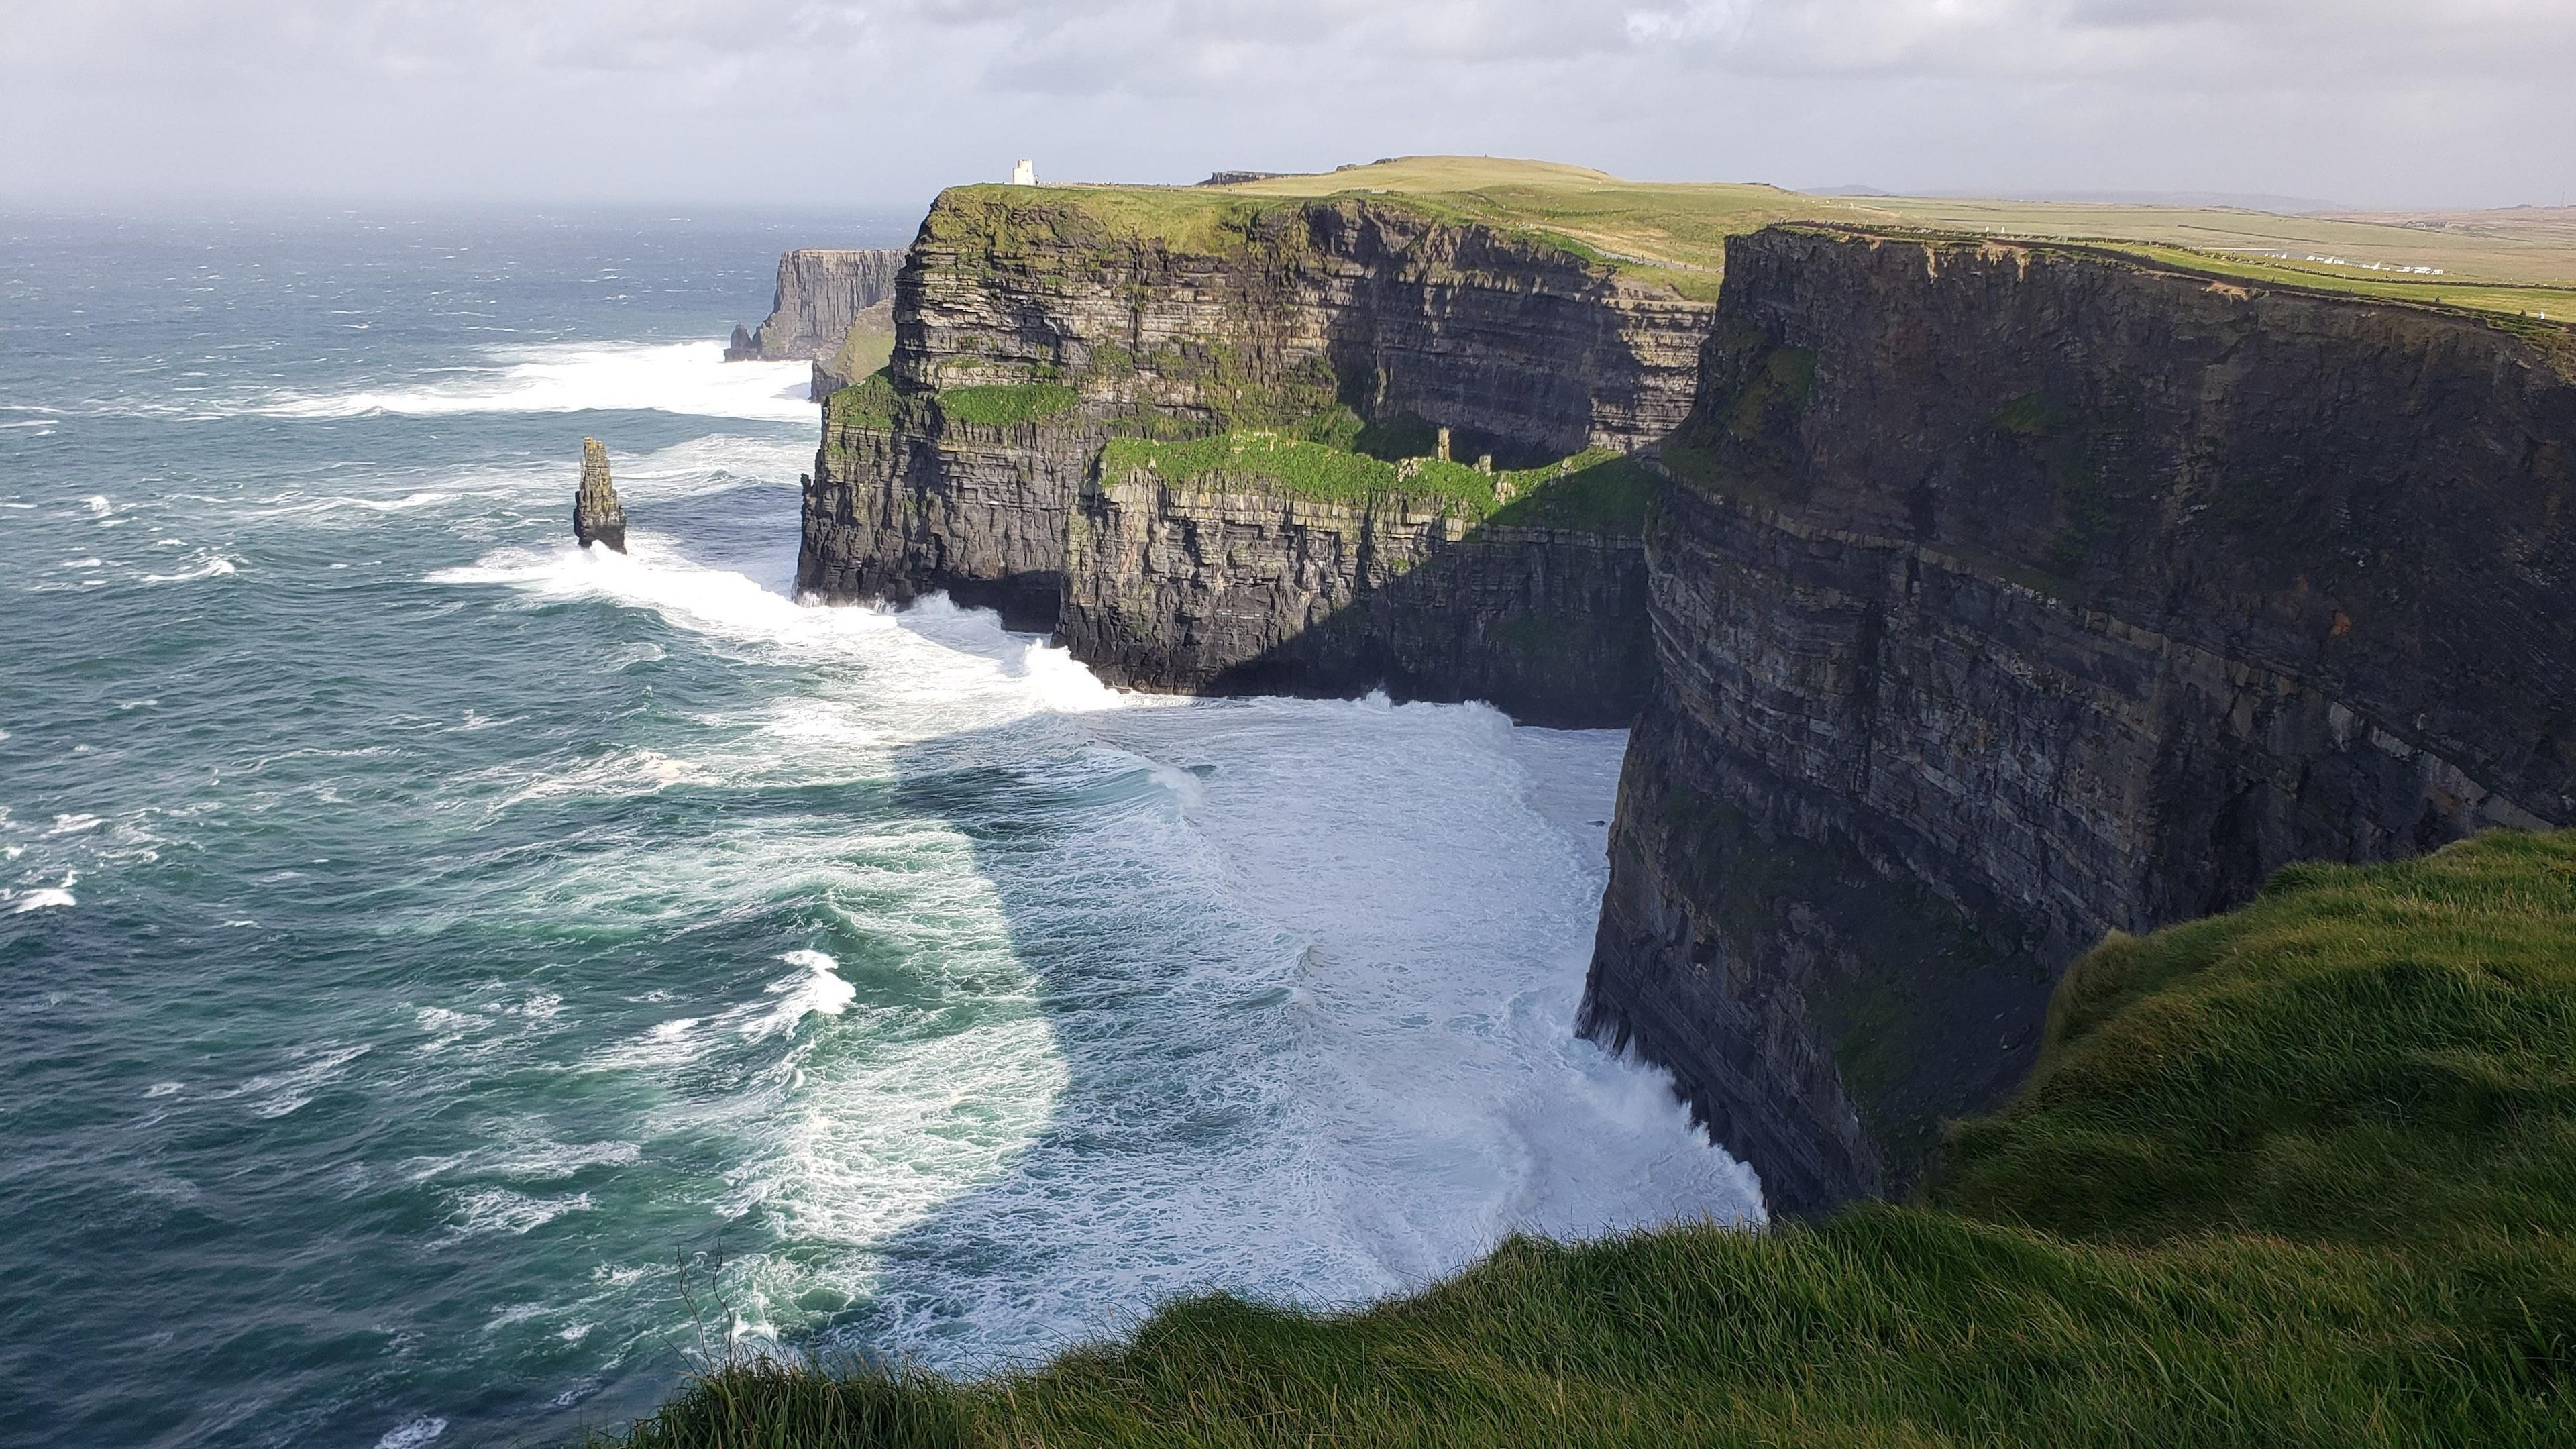 Cliffs Of Moher Ireland Wallpaper Cliffs Of Moher Active Wallpaper Desktop Background Images